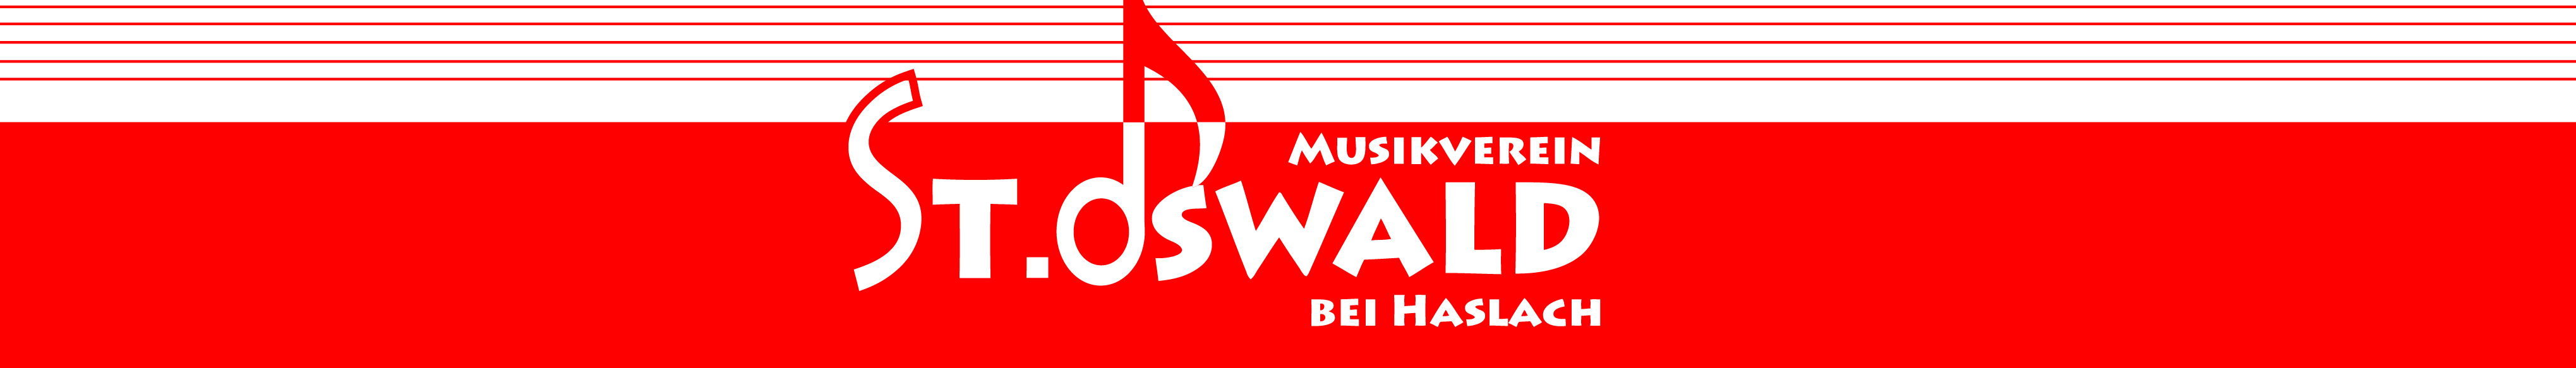 Musikverein St.Oswald